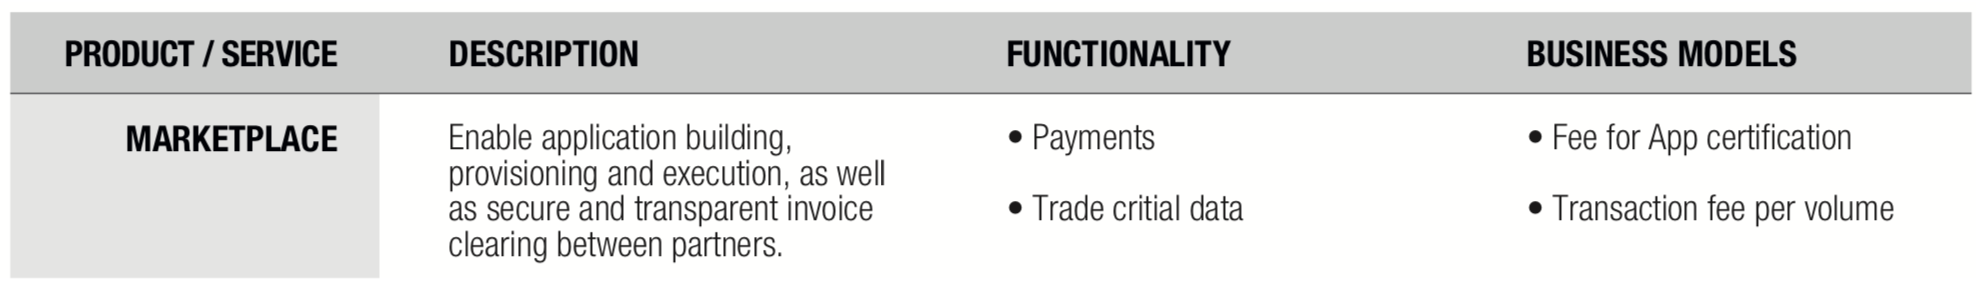 Description of the Marketplace Model